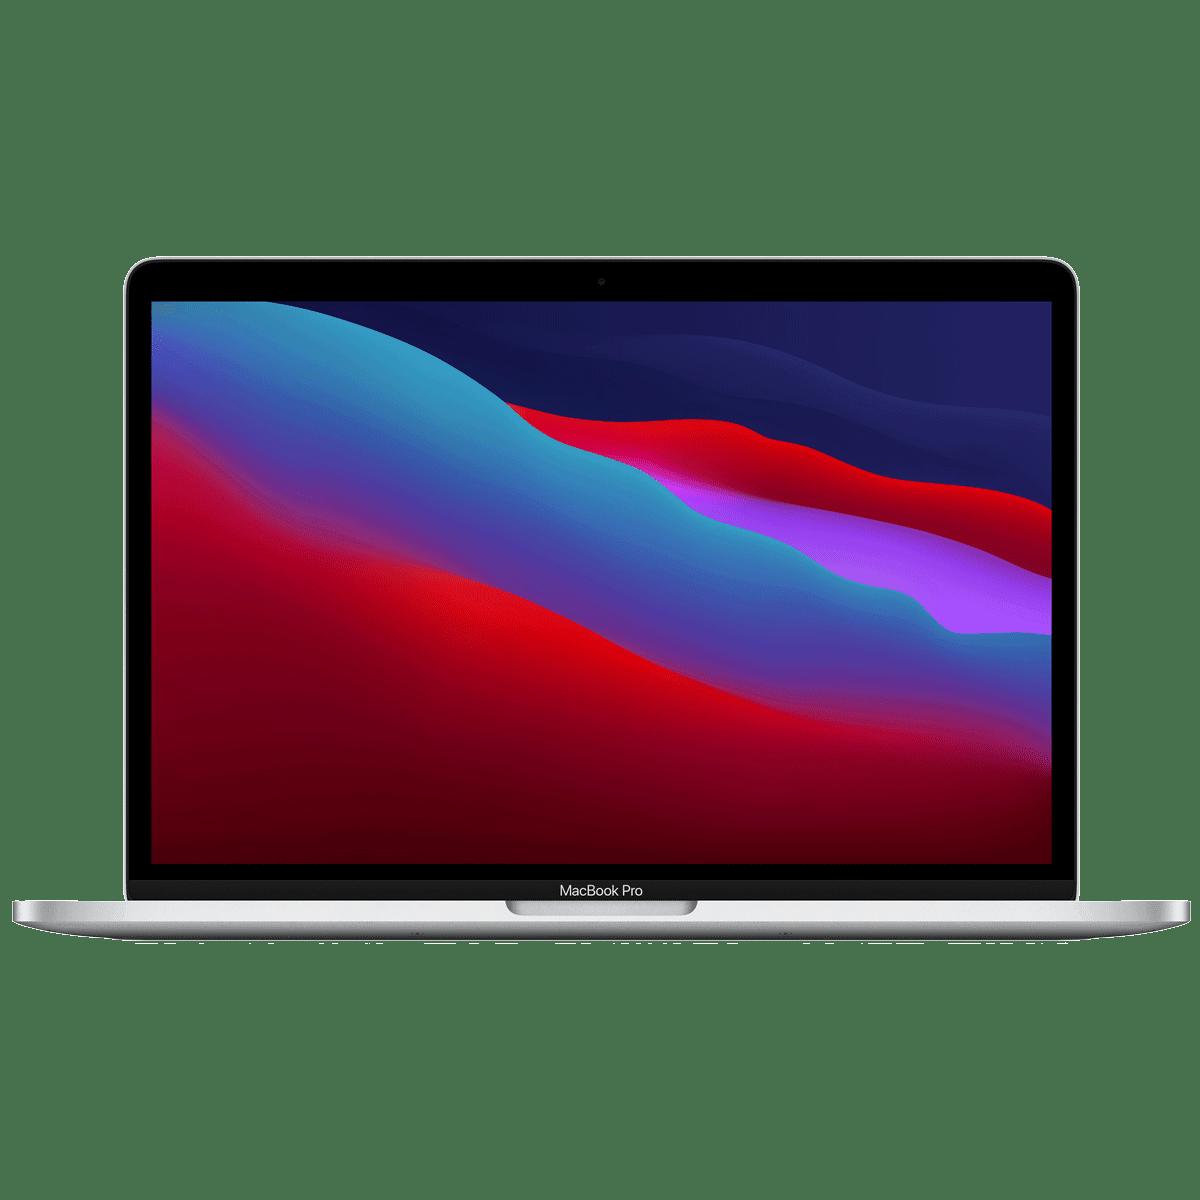 Apple MacBook Pro (MYDA2HN/A) M1 Chip macOS Big Sur Laptop (8GB RAM, 256GB SSD, Apple M1 GPU, 33.78cm, Silver)